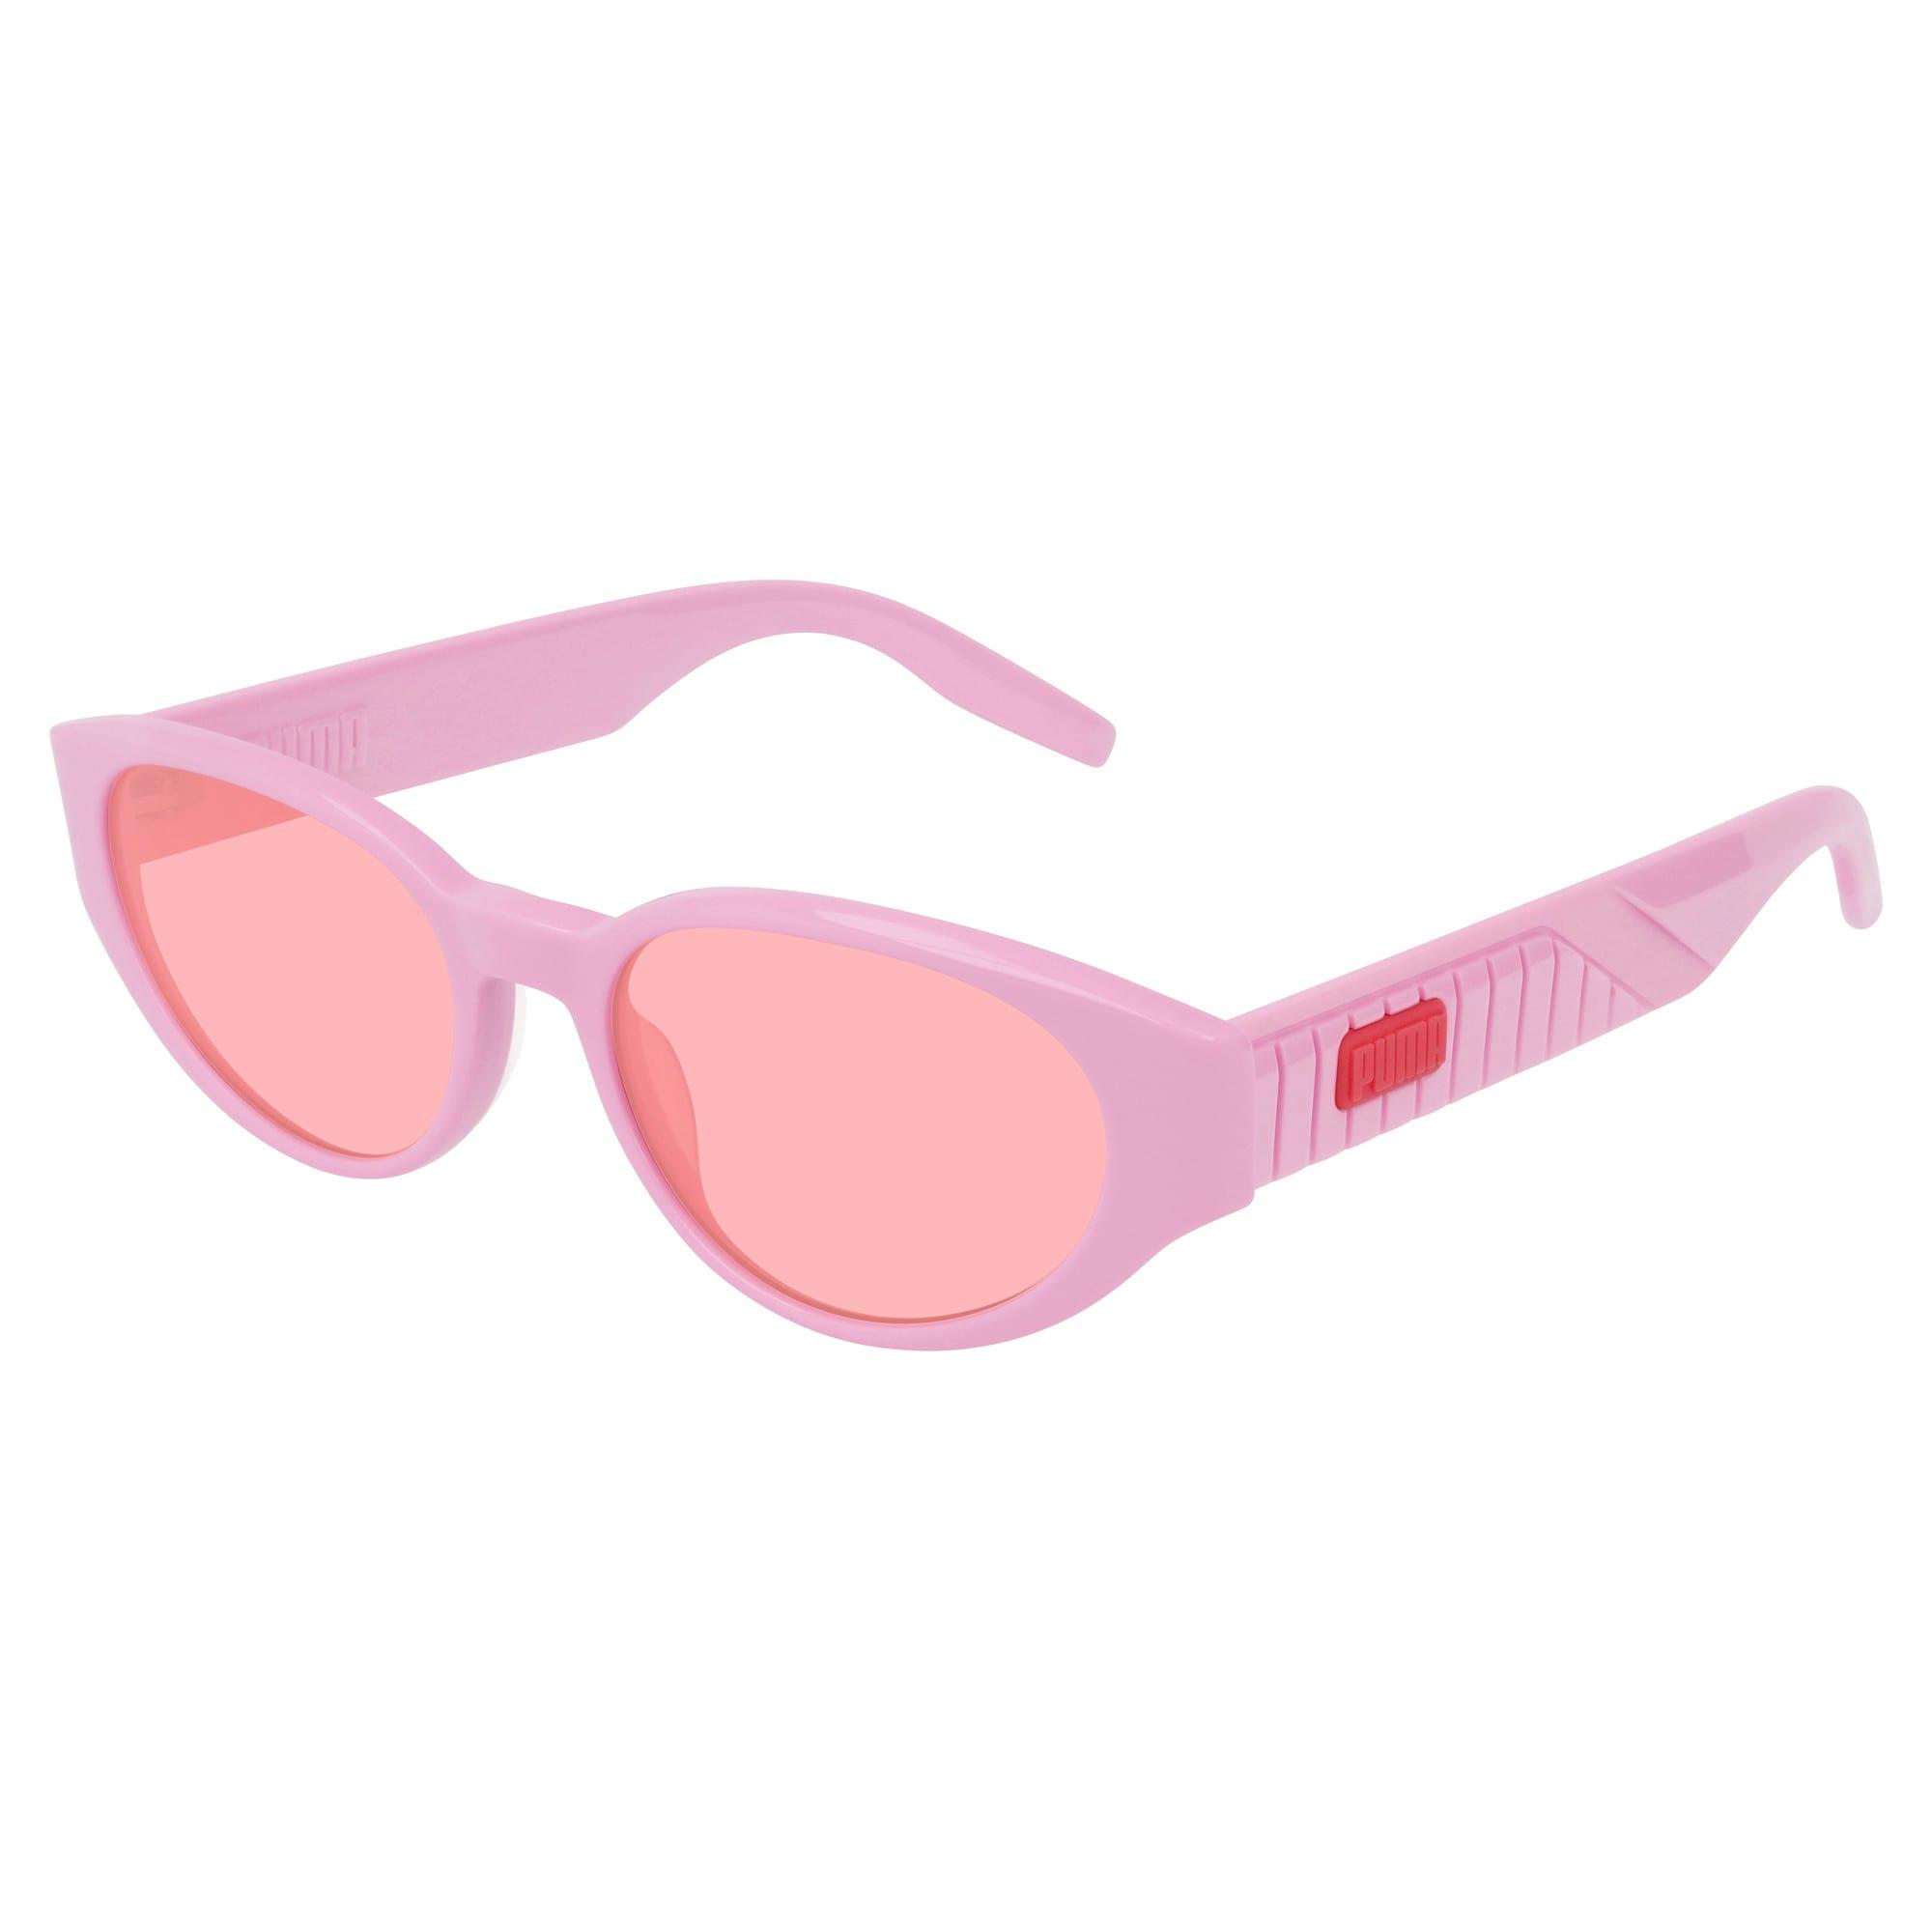 Victoria Beach zonnebril voor Dames, Roze/Rood | PUMA